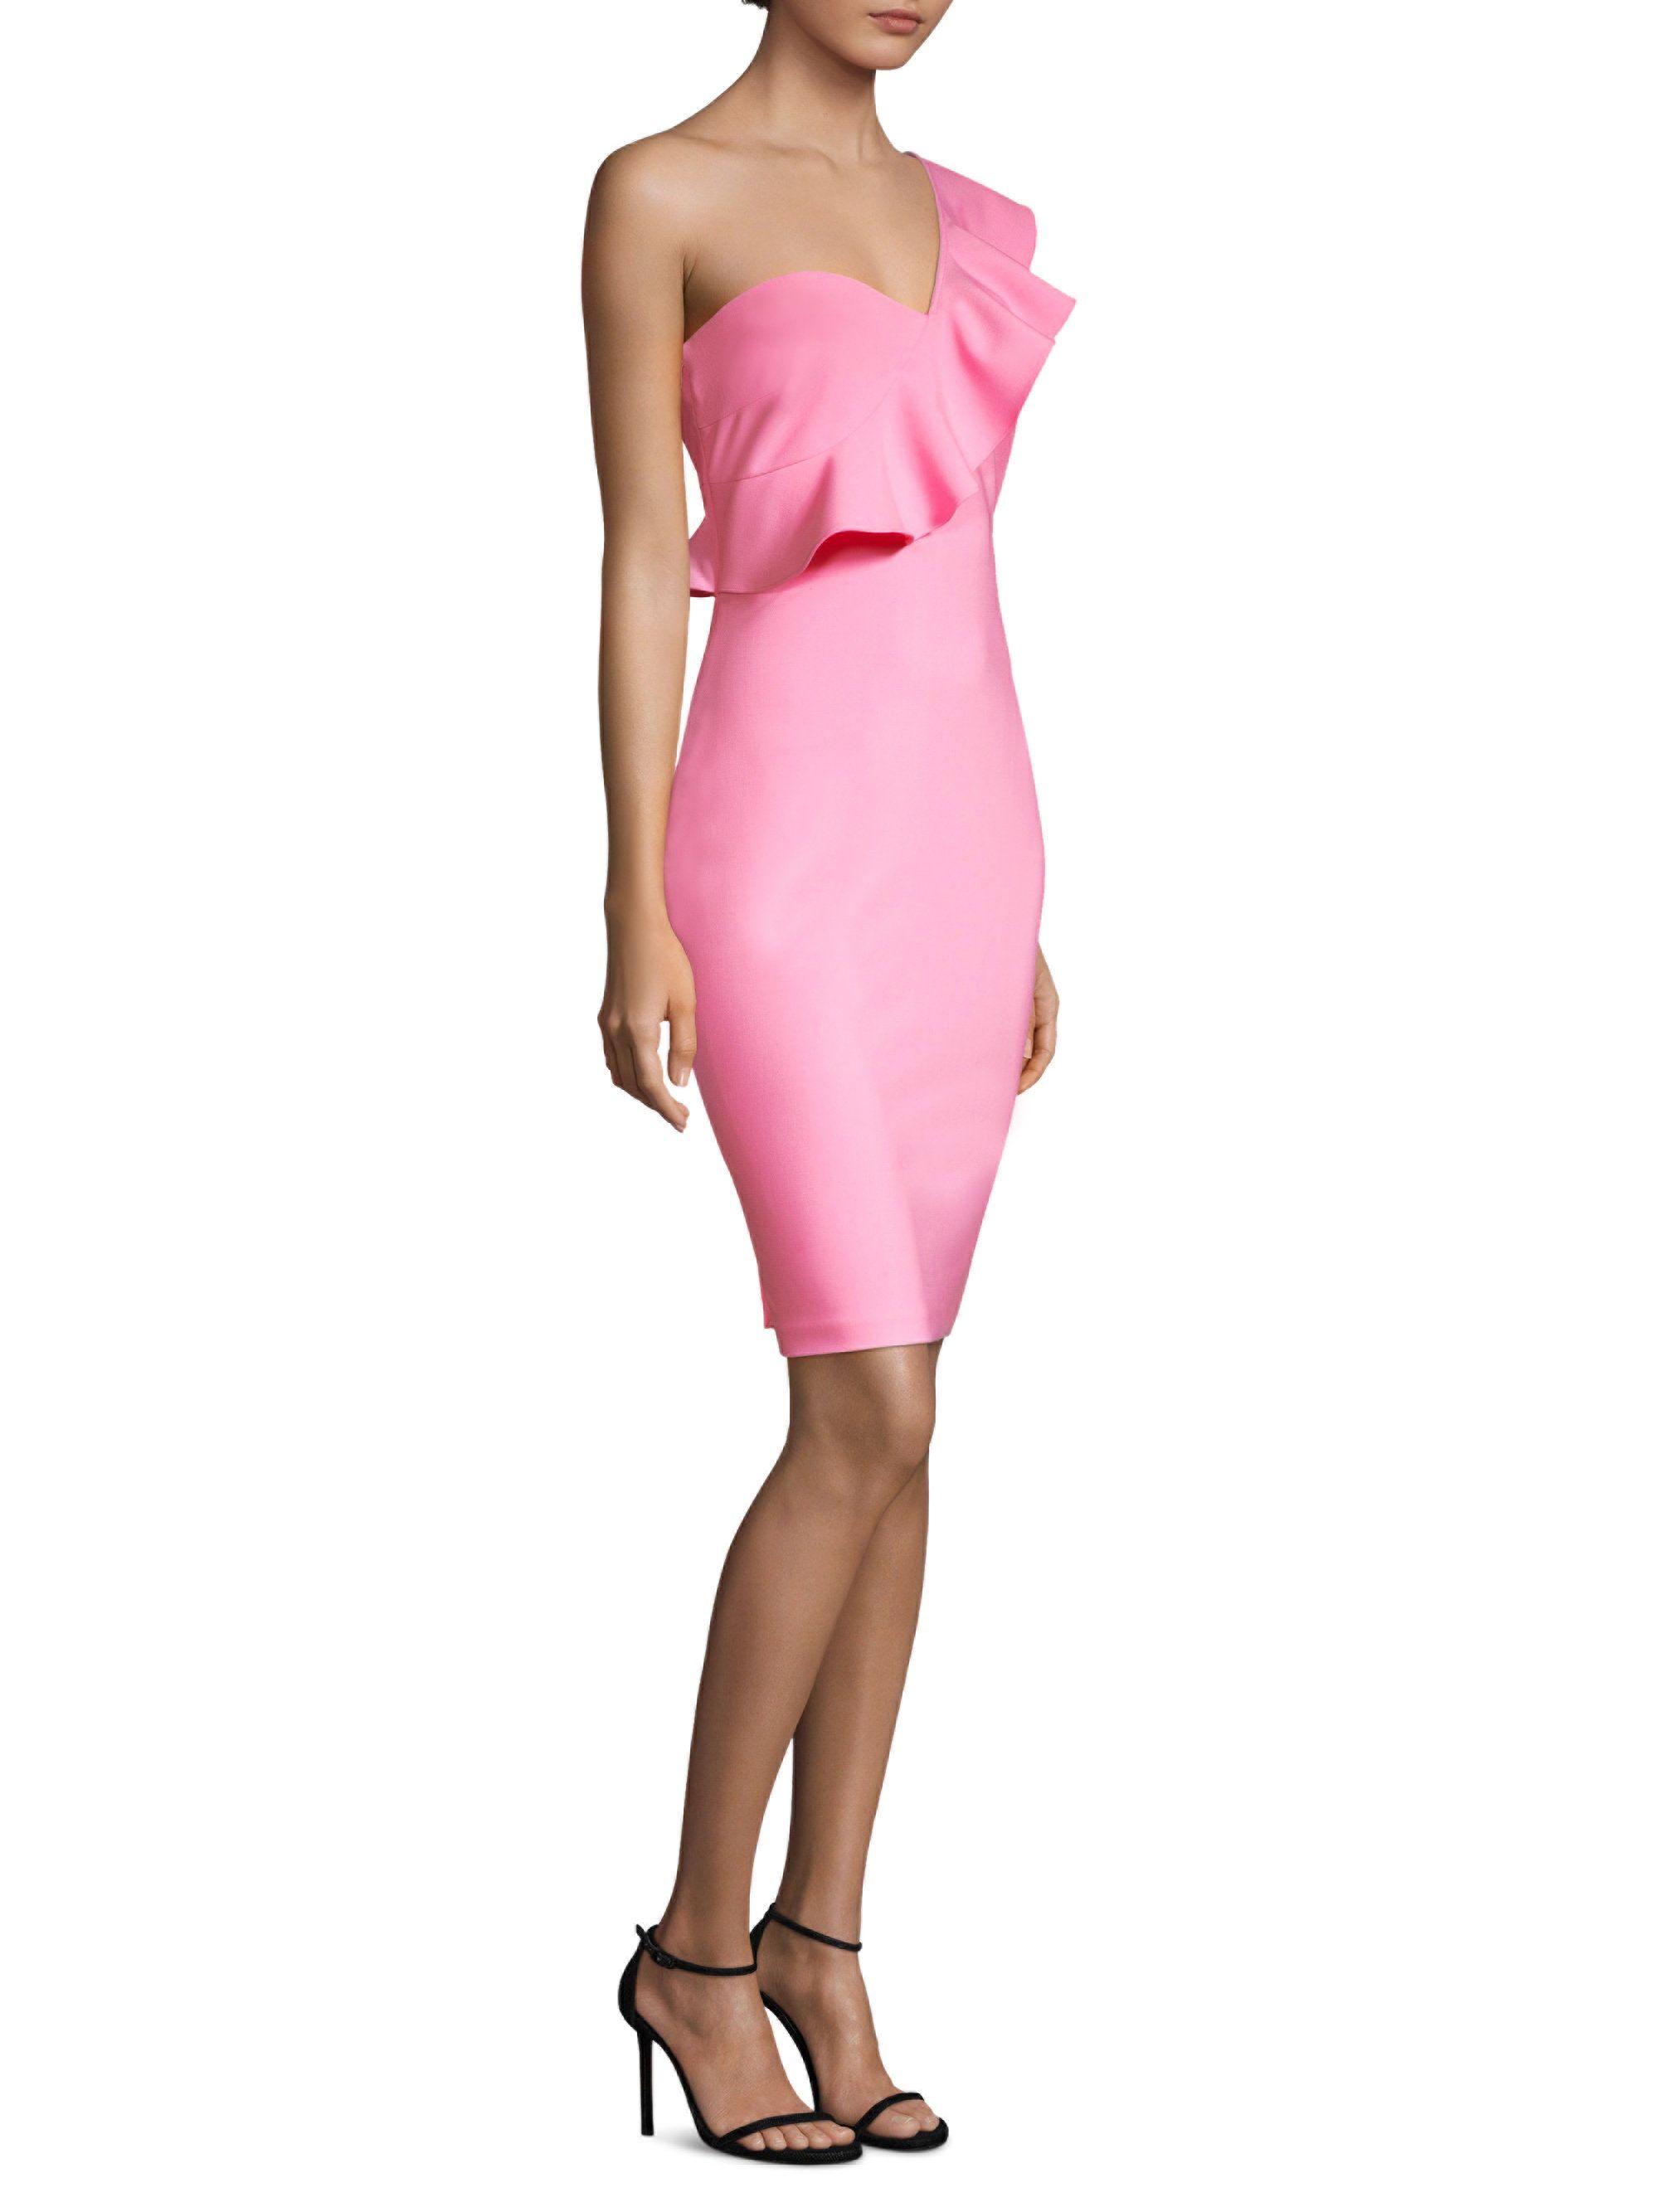 Dorable Saks Fifth Avenue Vestidos De Cóctel Modelo - Colección de ...